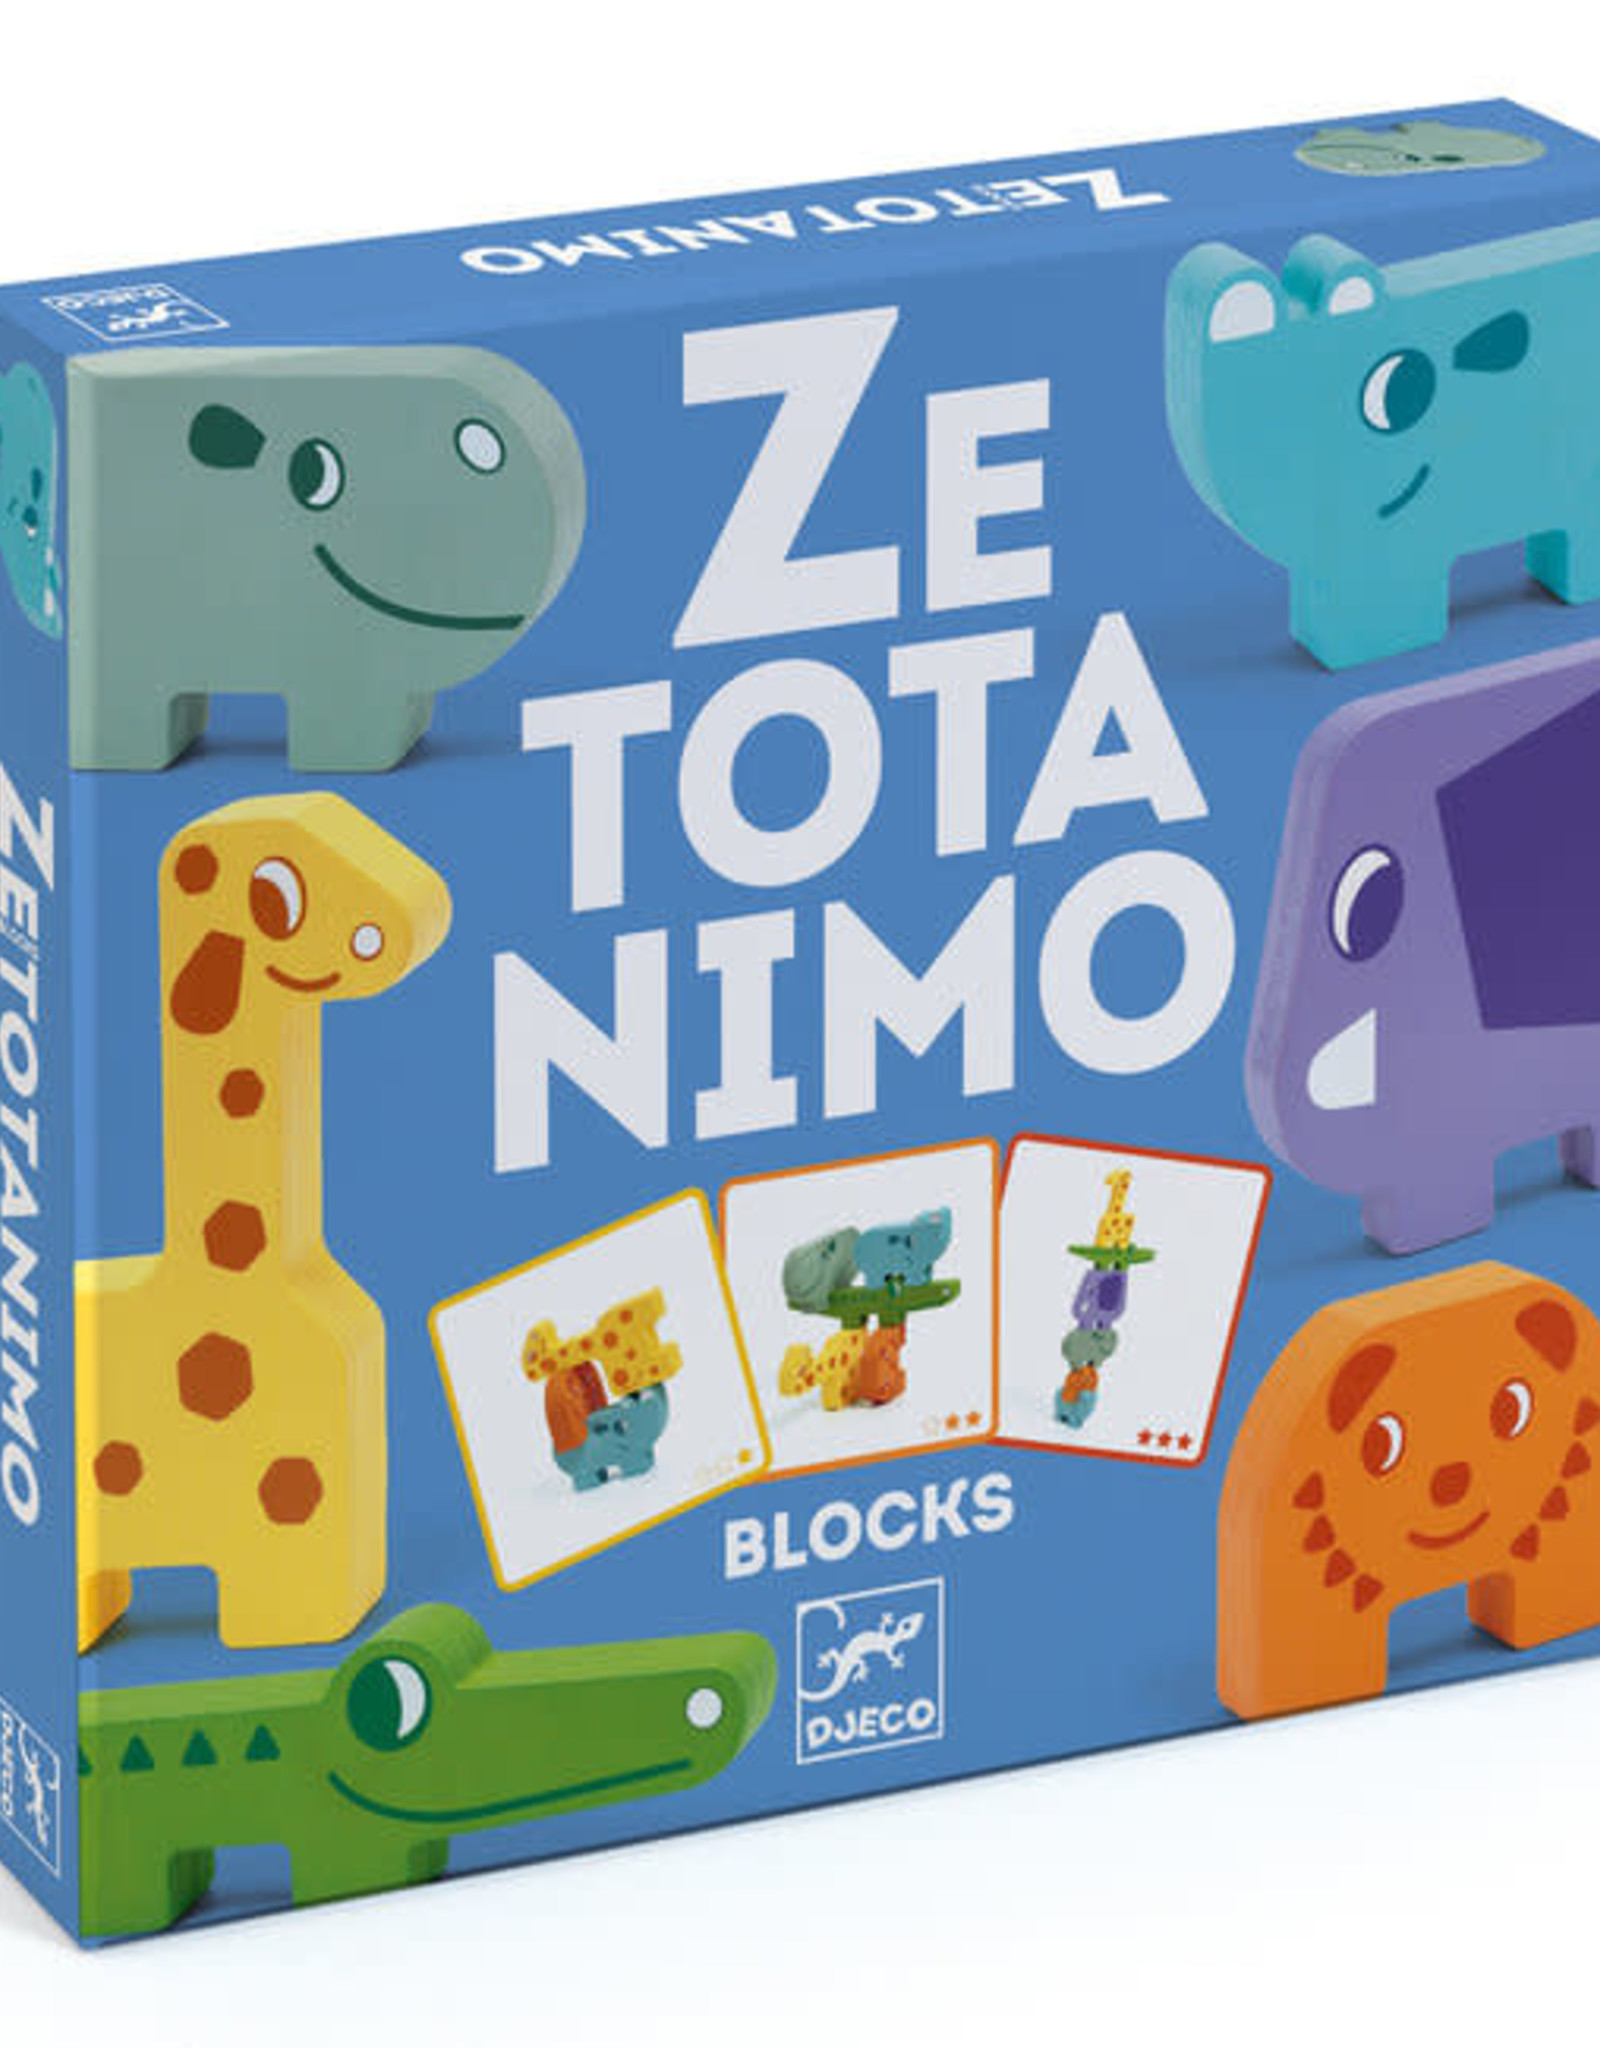 Djeco Djeco Construction Game - Ze Totanimo